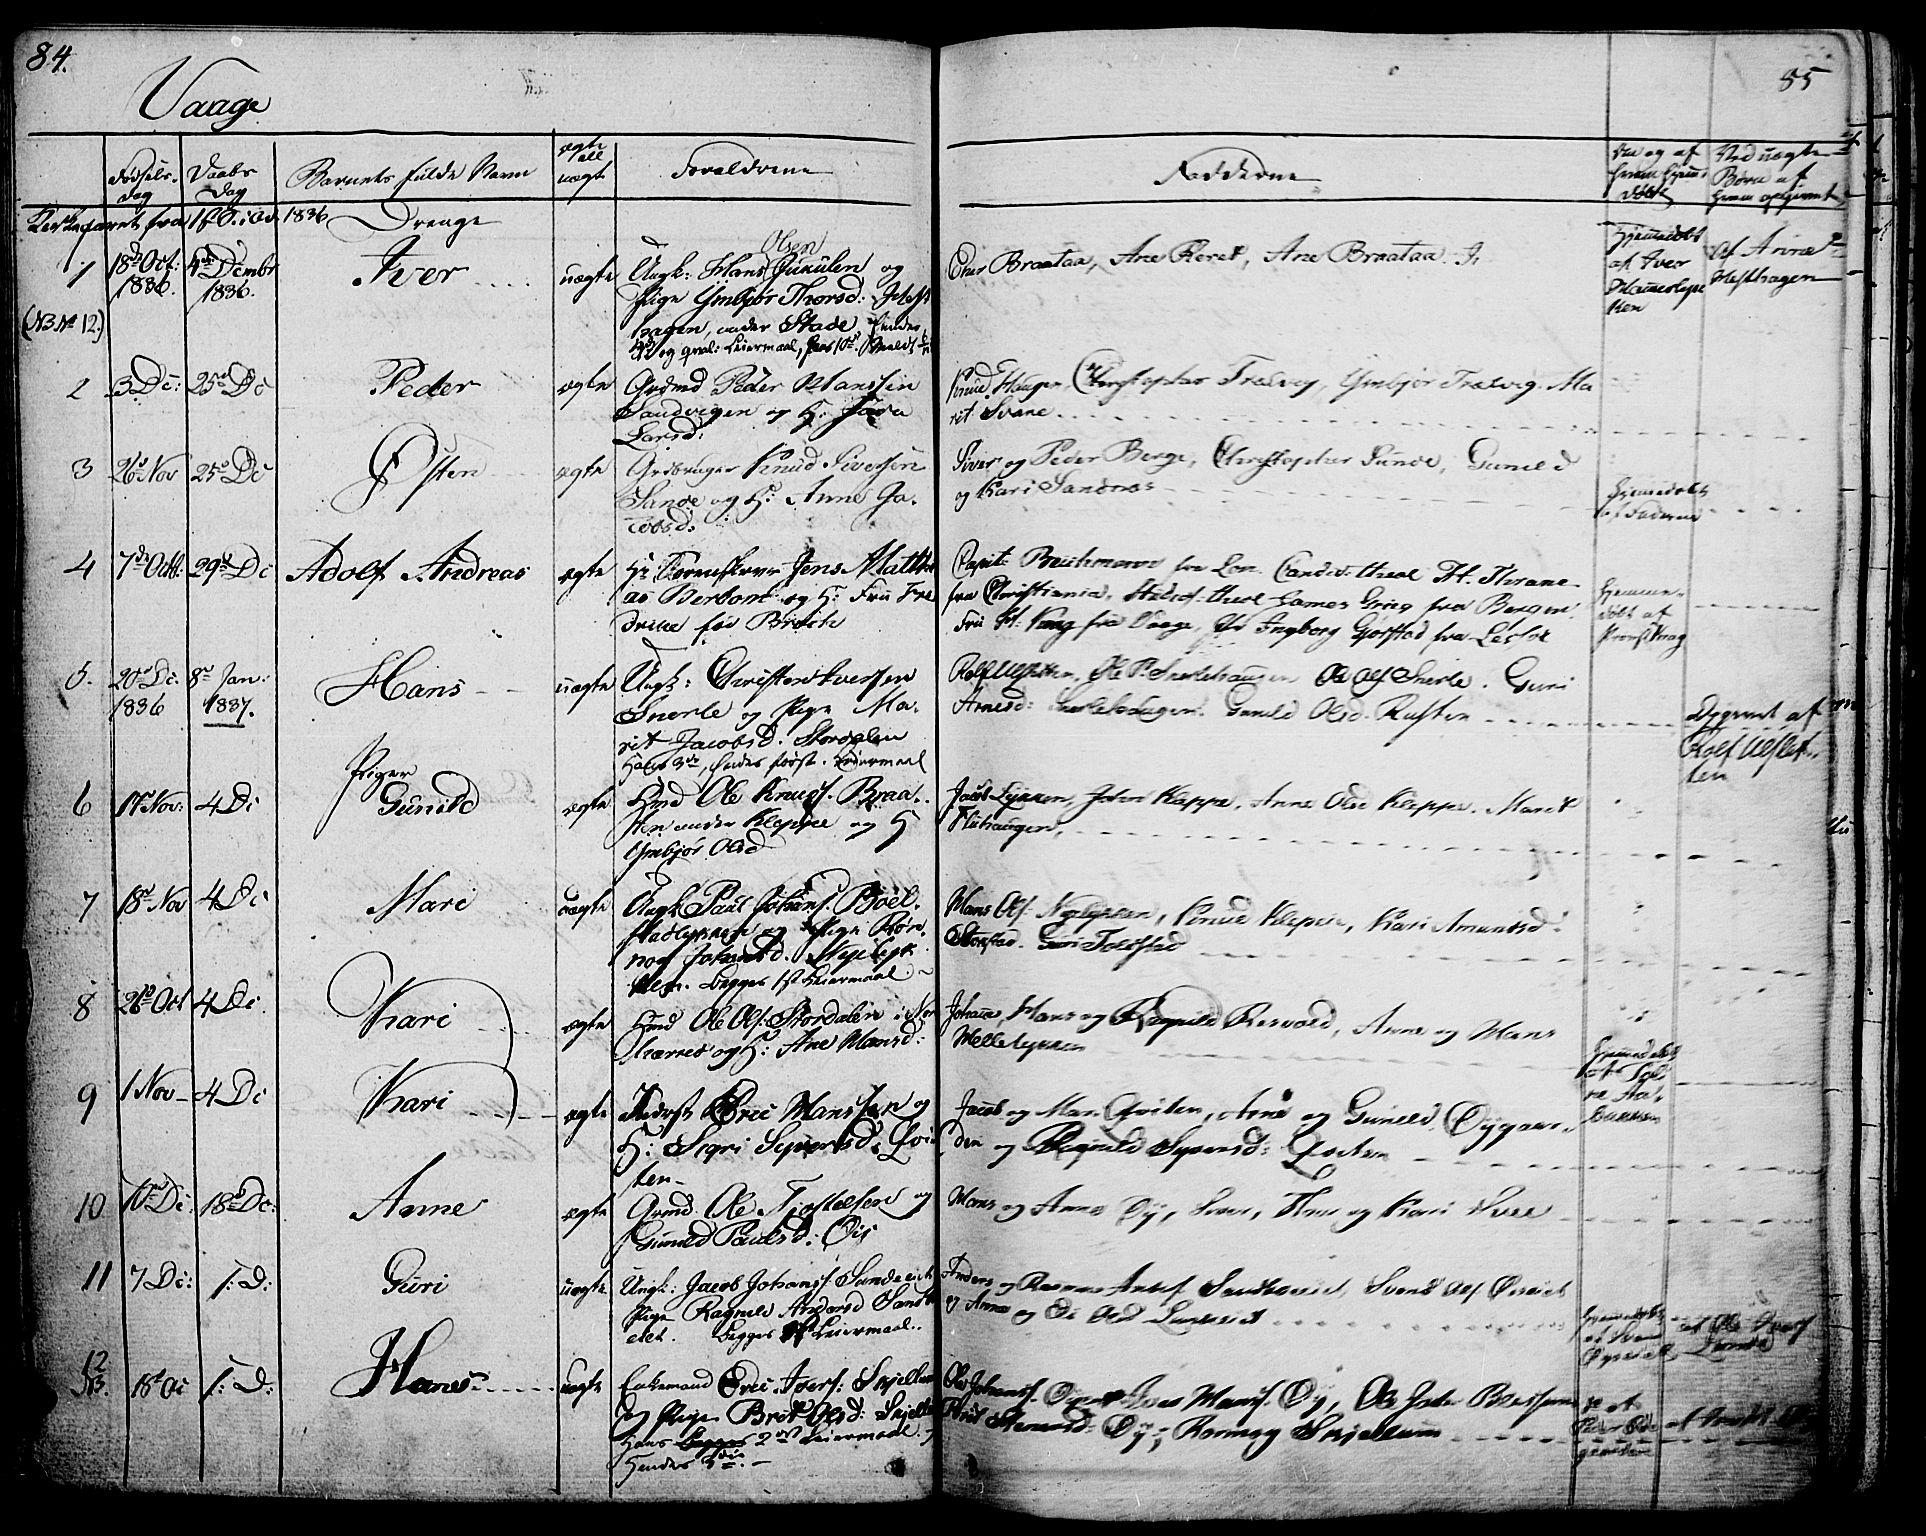 SAH, Vågå prestekontor, Ministerialbok nr. 4 /1, 1827-1842, s. 84